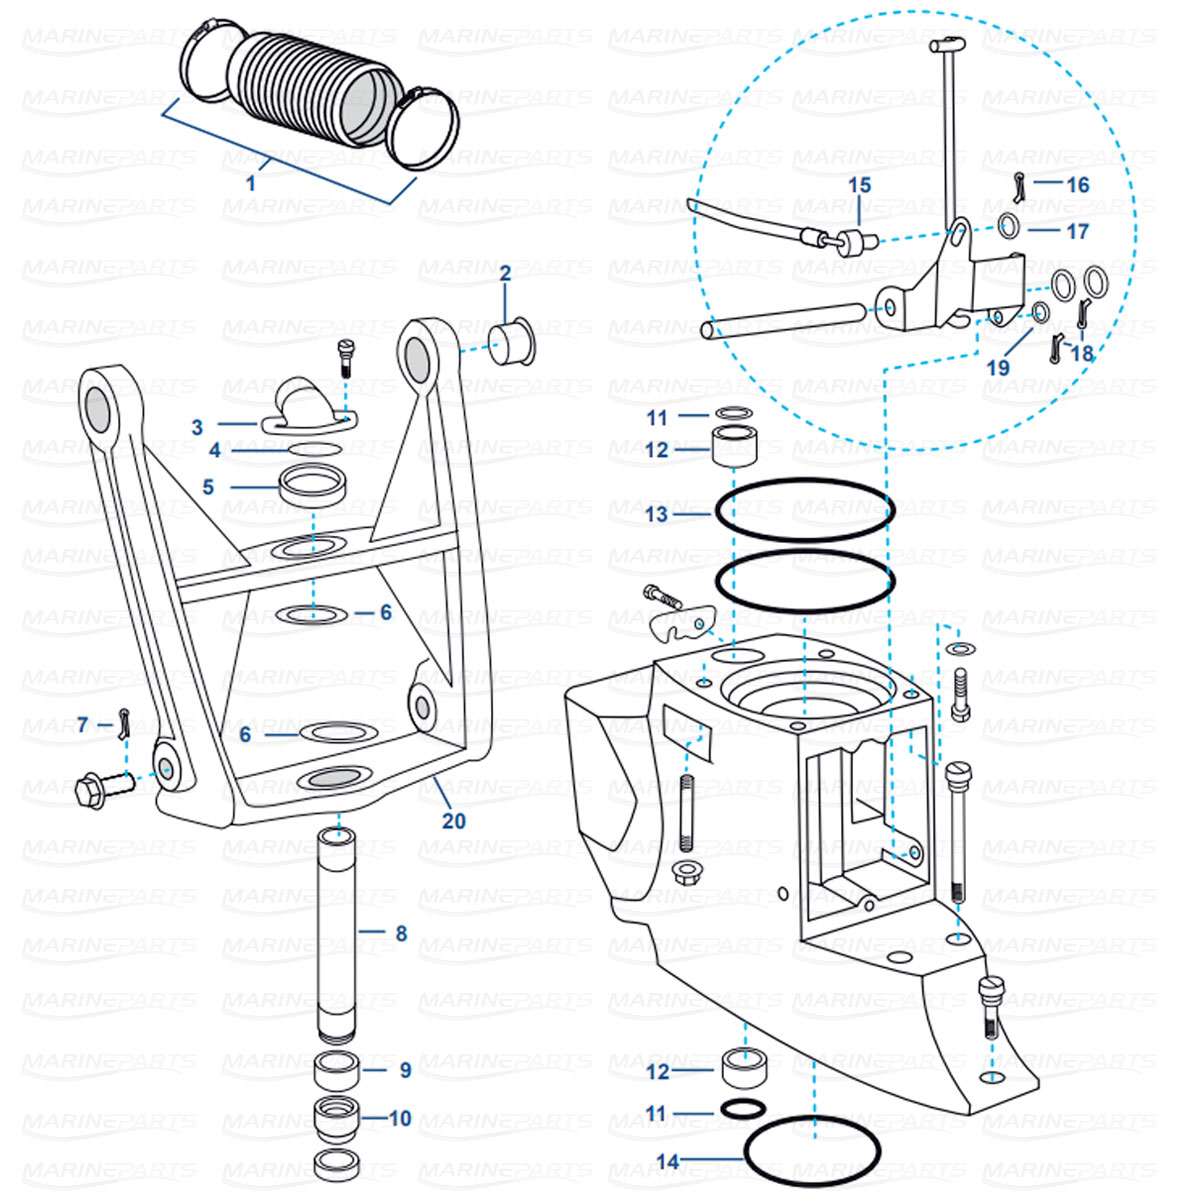 Spare parts » Inboards » Volvo Penta » Transom/Sterndrive